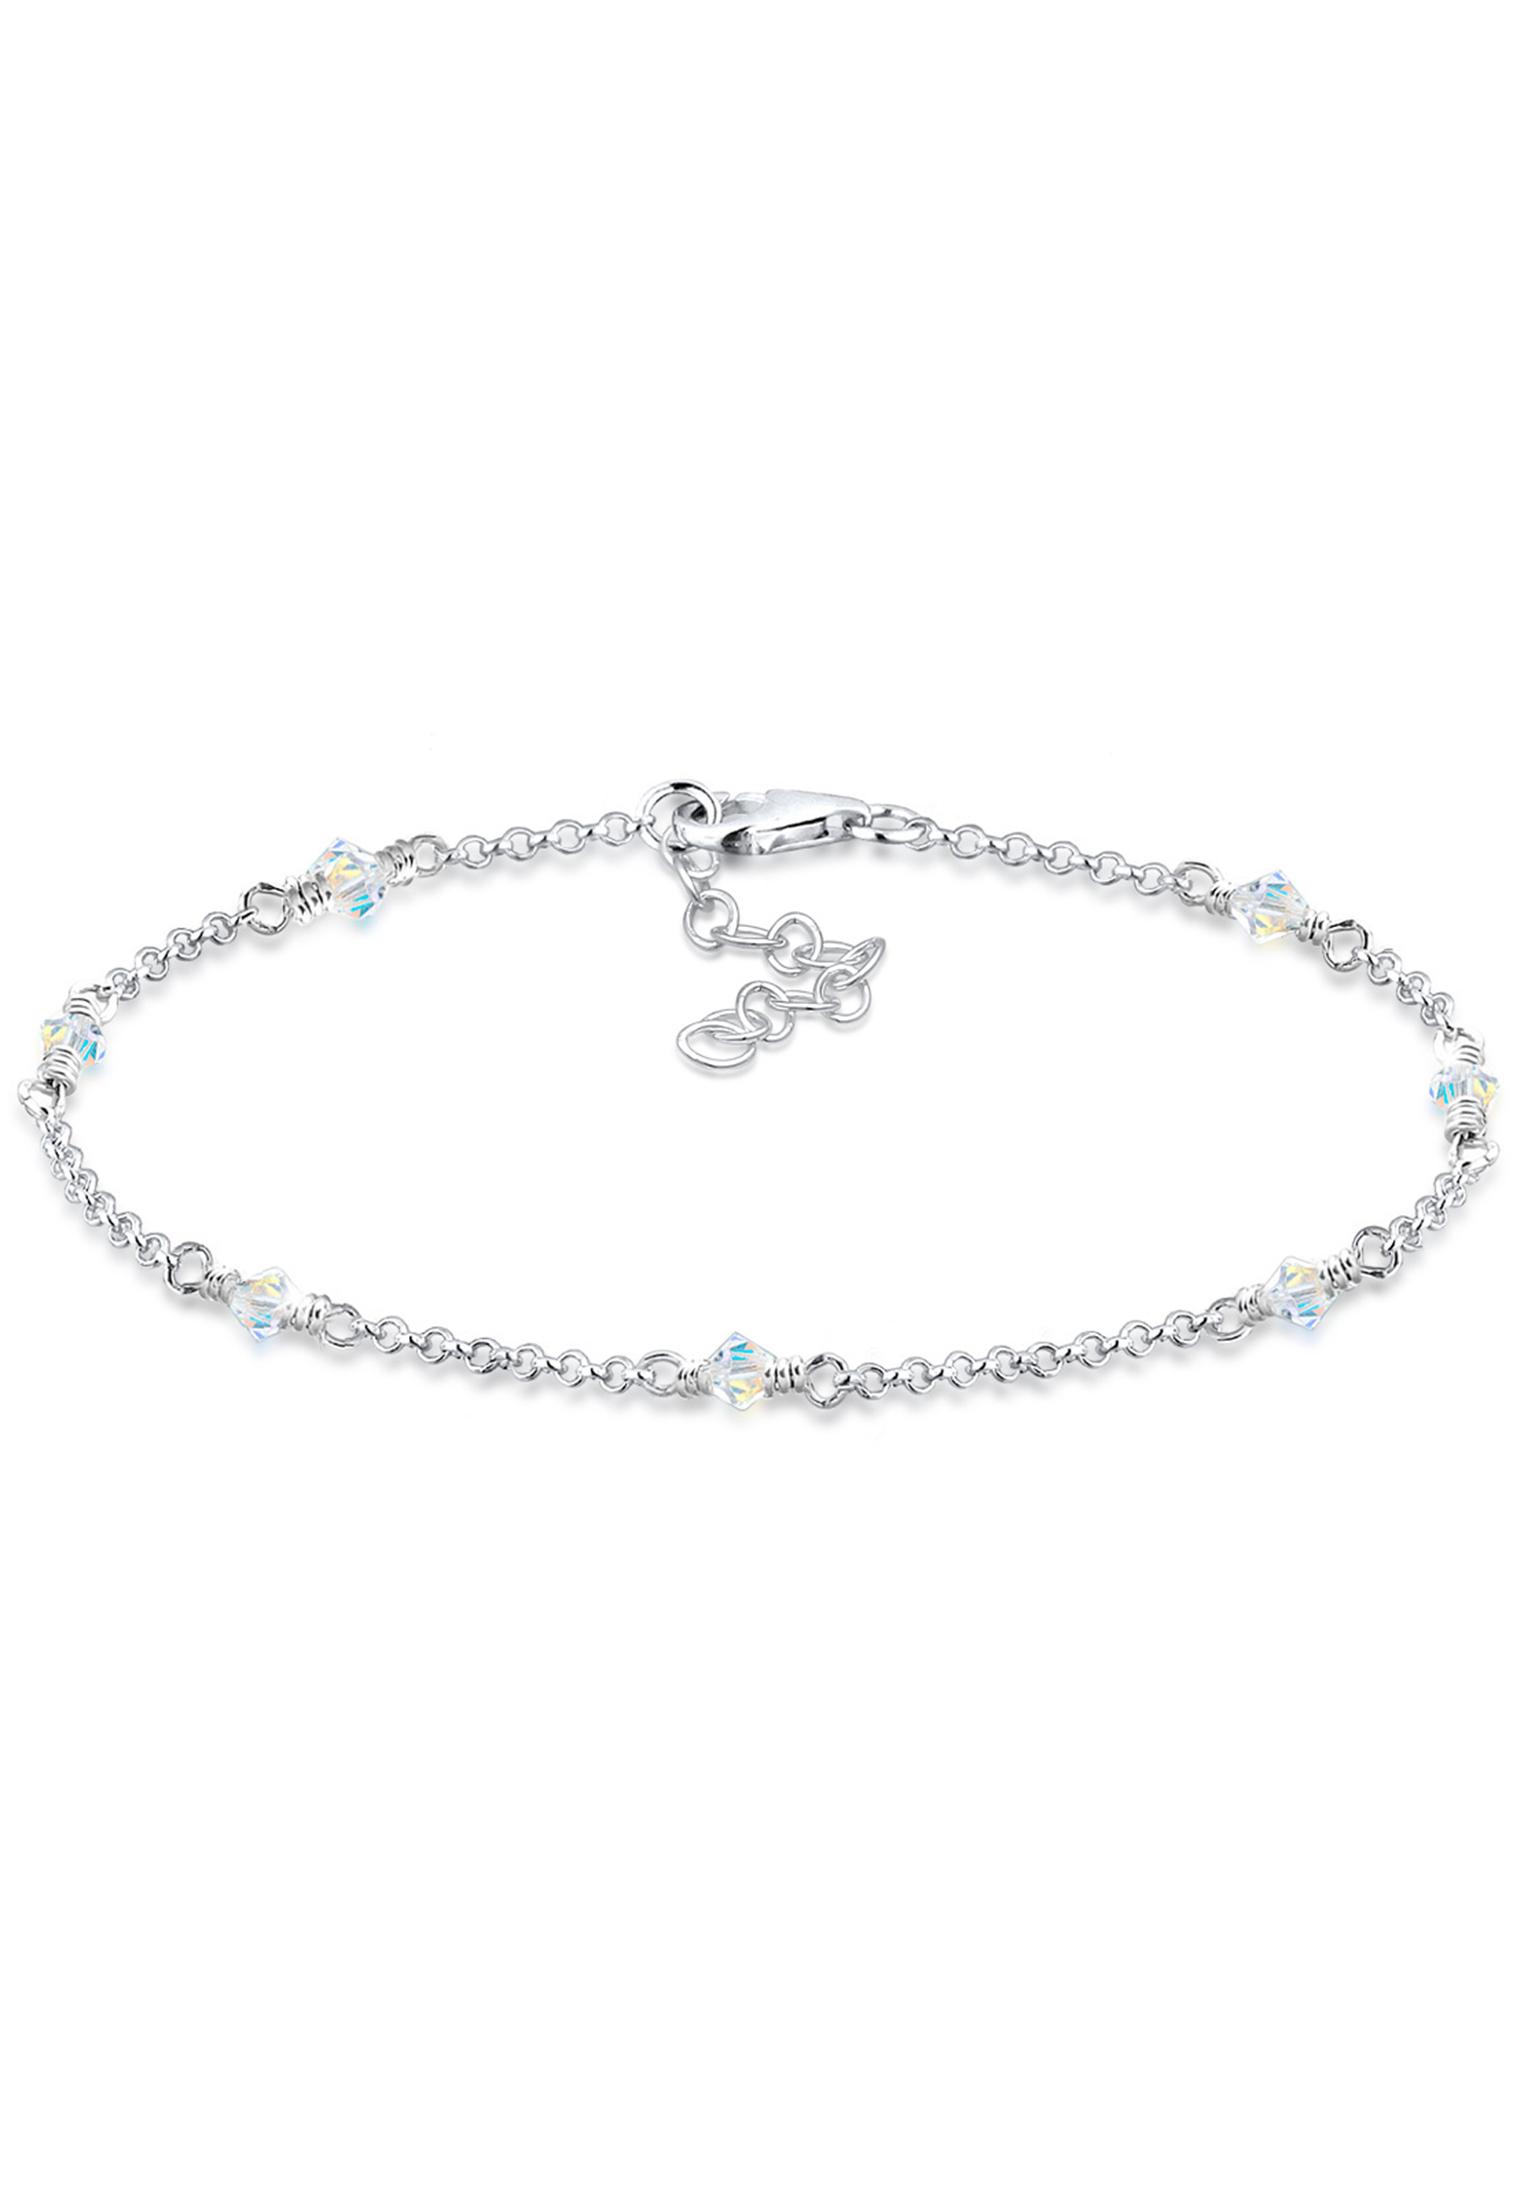 Armband   Kristall ( Weiß )   925er Sterling Silber